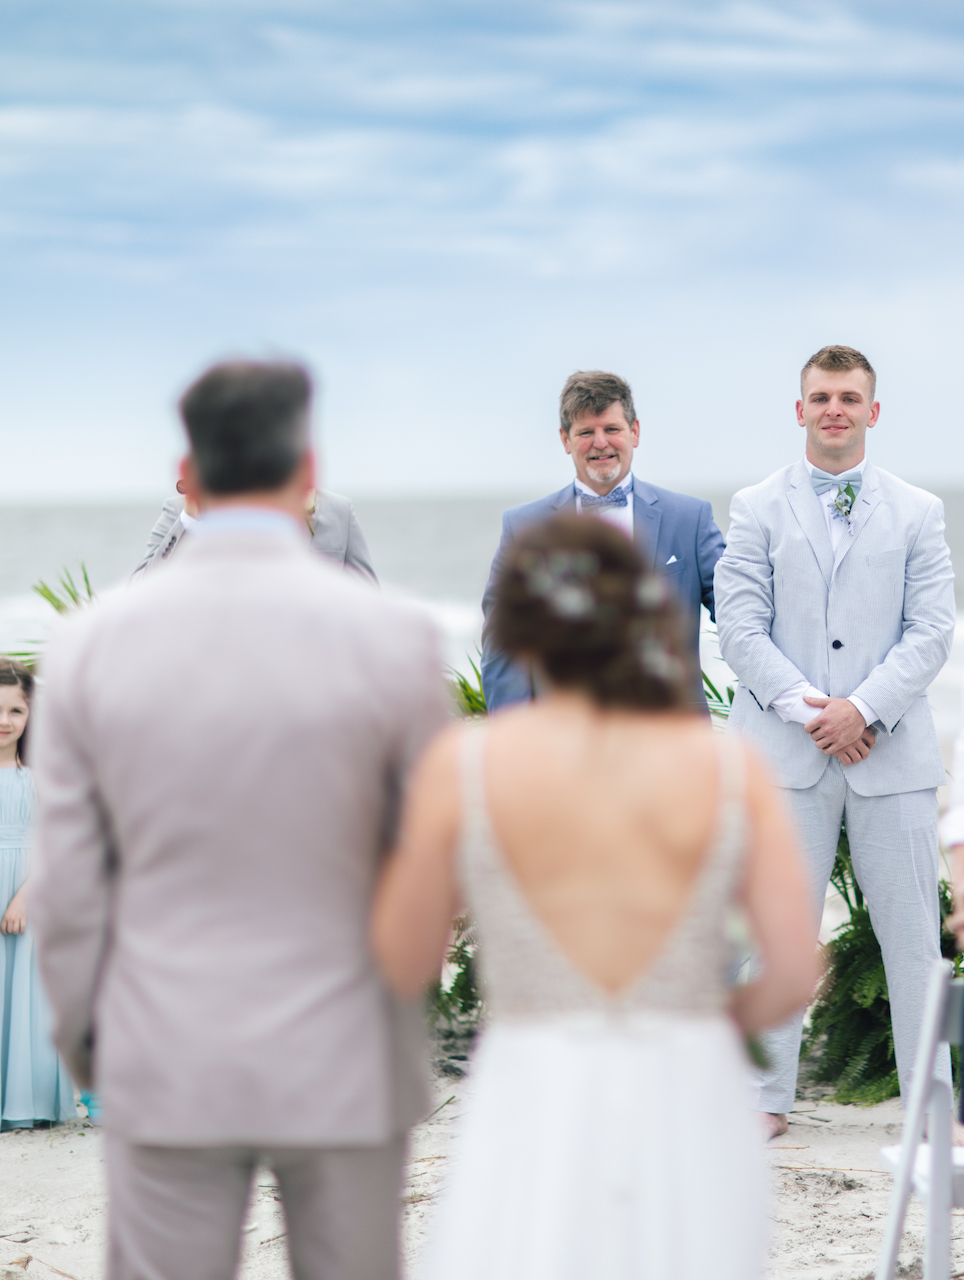 hilton-head-island-wedding-sc-ceremony46.jpg